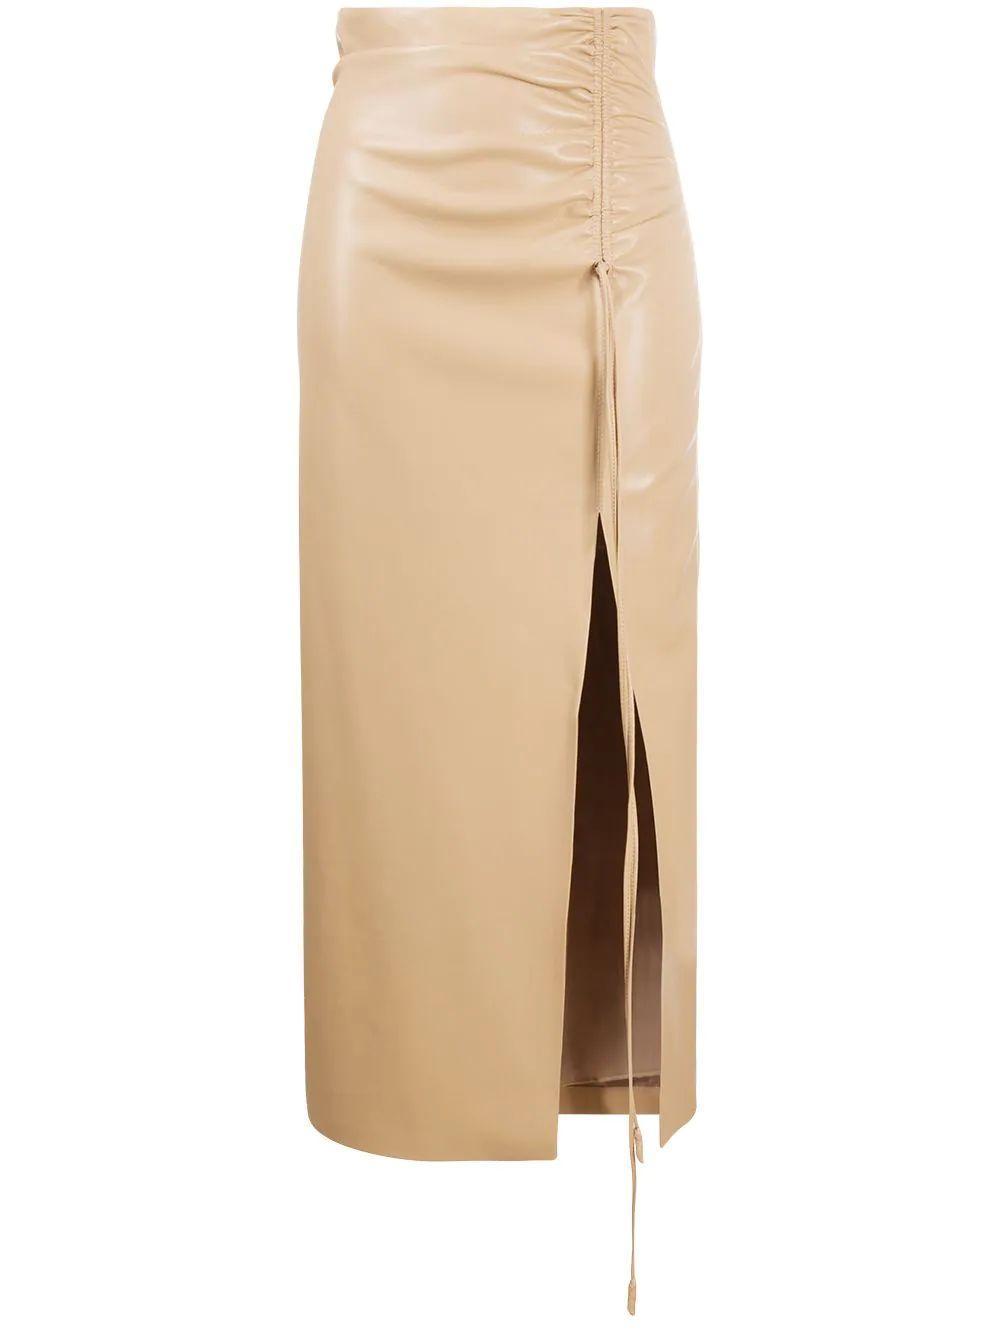 Malorie Vegan Leather Midi Skirt Item # NW21SSSK01273